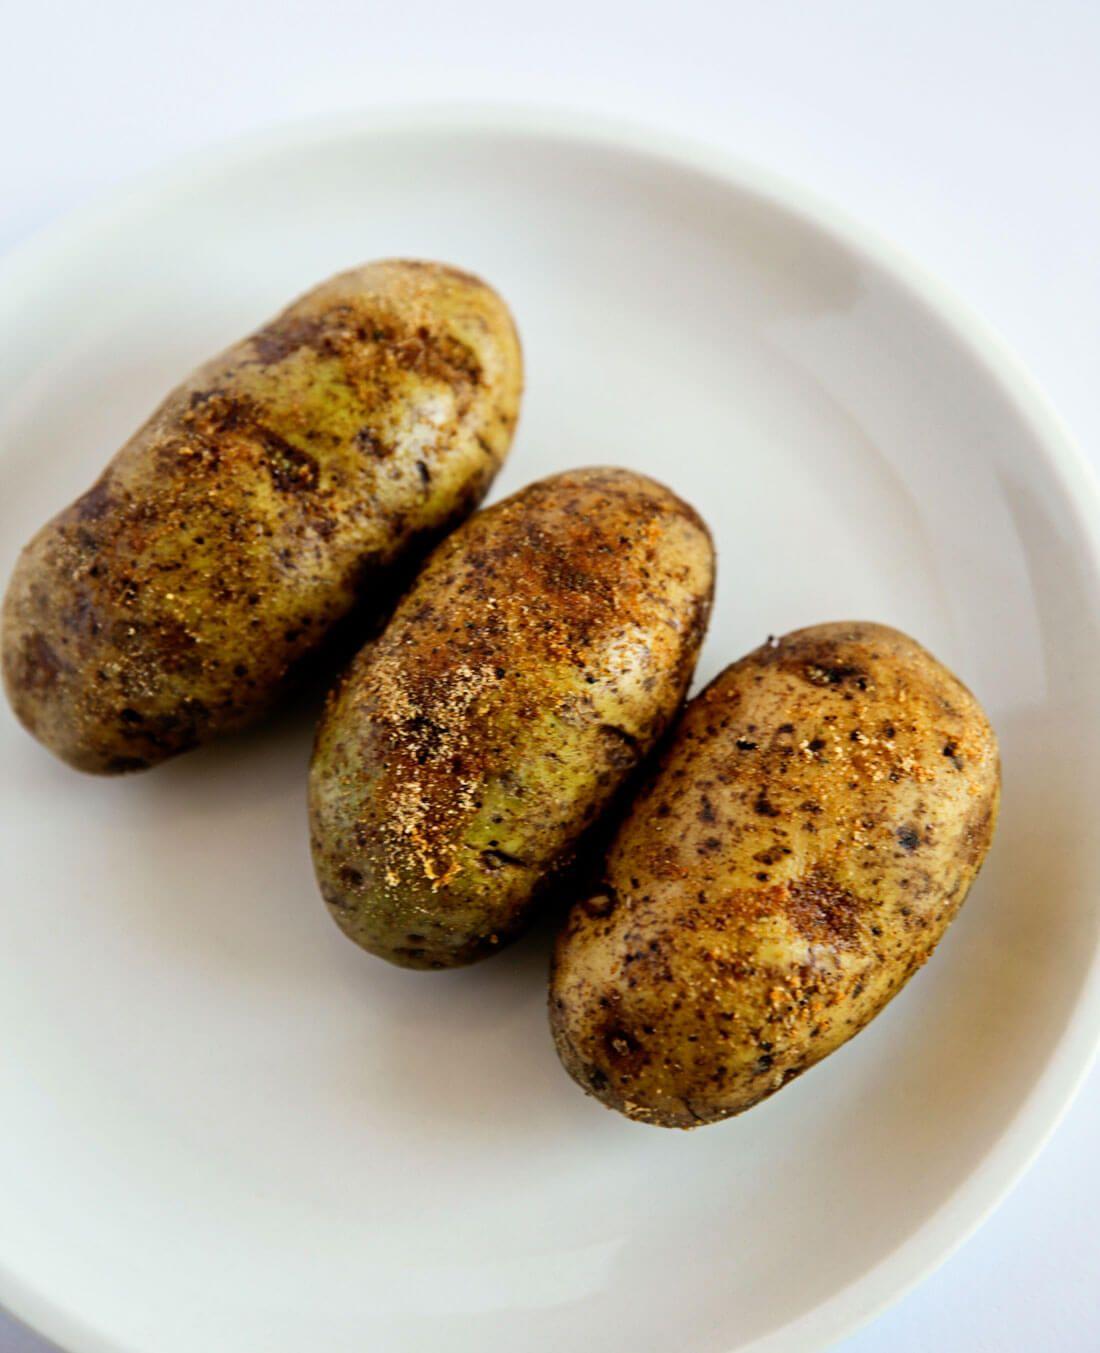 Air Fryer Baked Potatoes Recipe Air fryer recipes